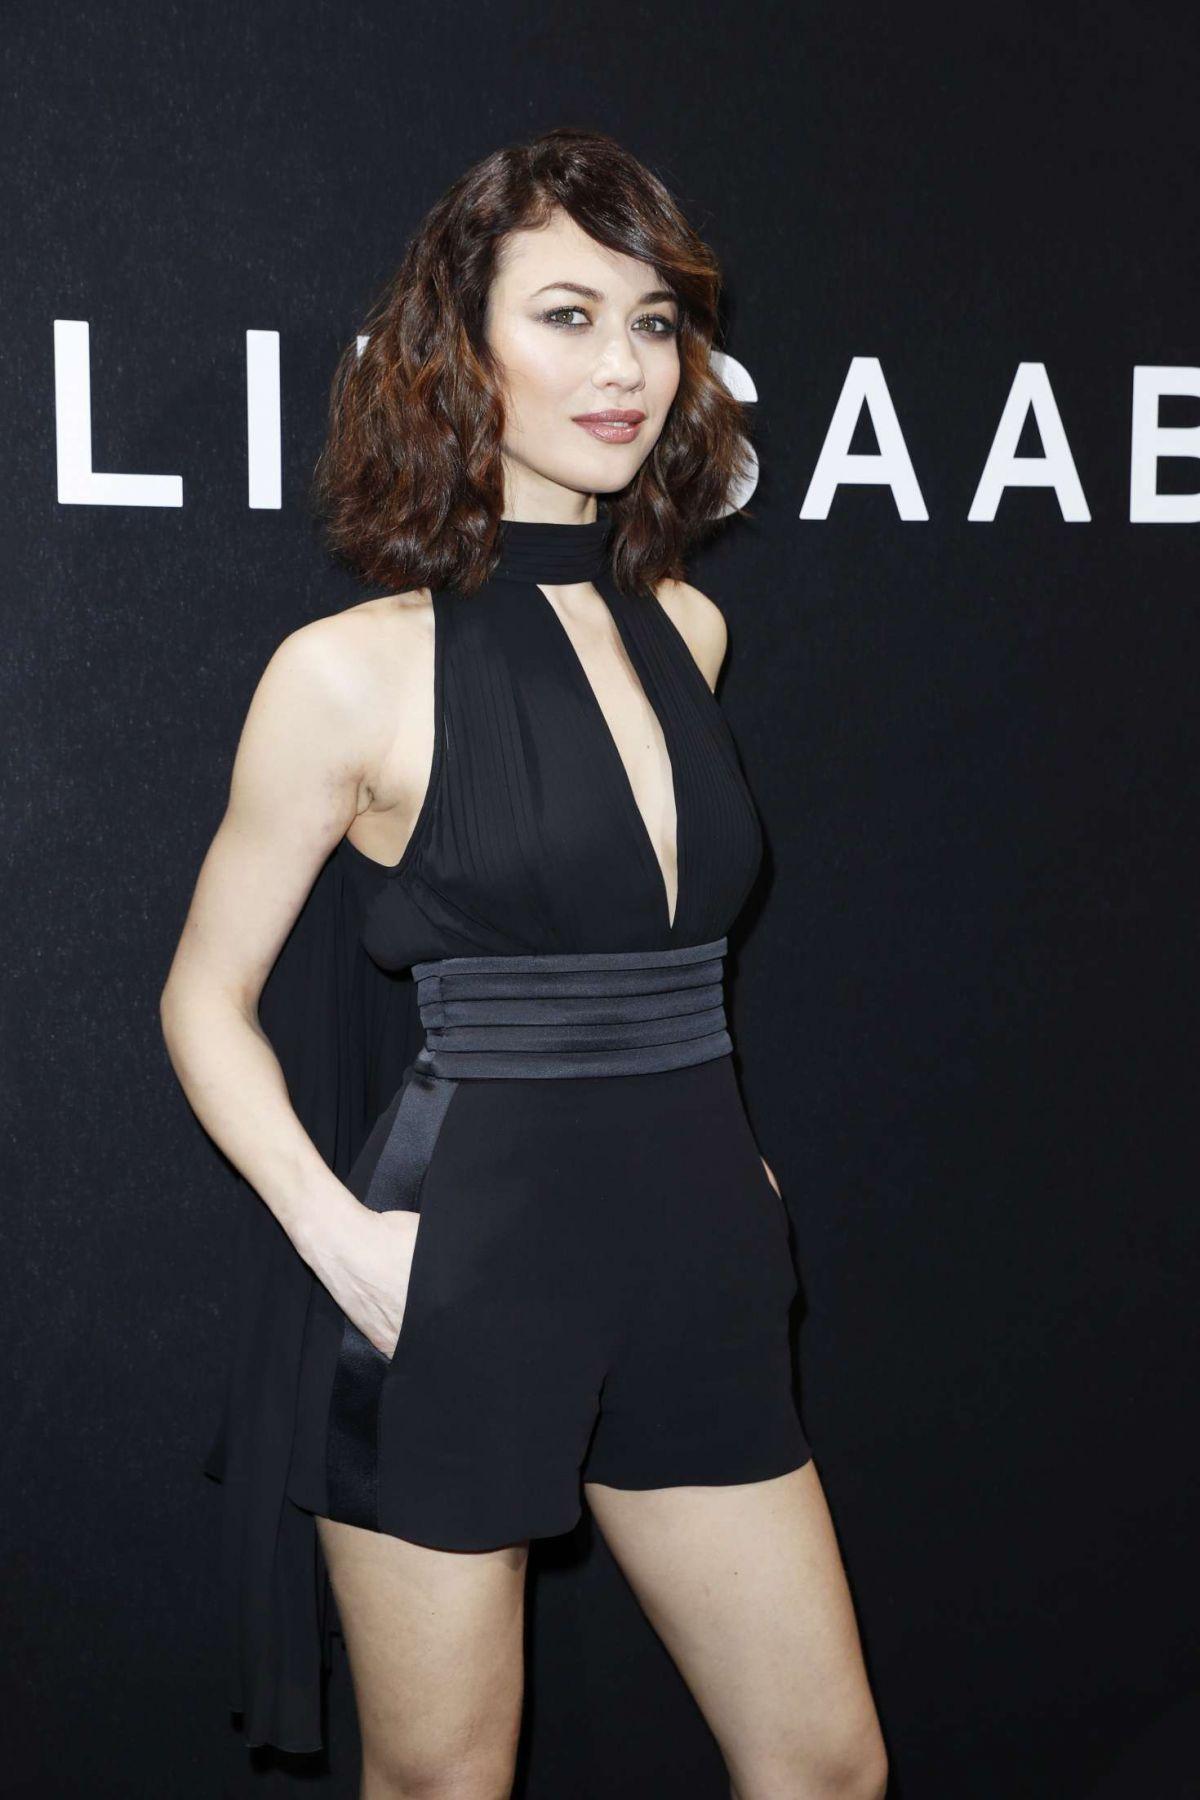 OLGA KURYLENKO at Elie Saab Fashion Show in Paris 01/25/2017